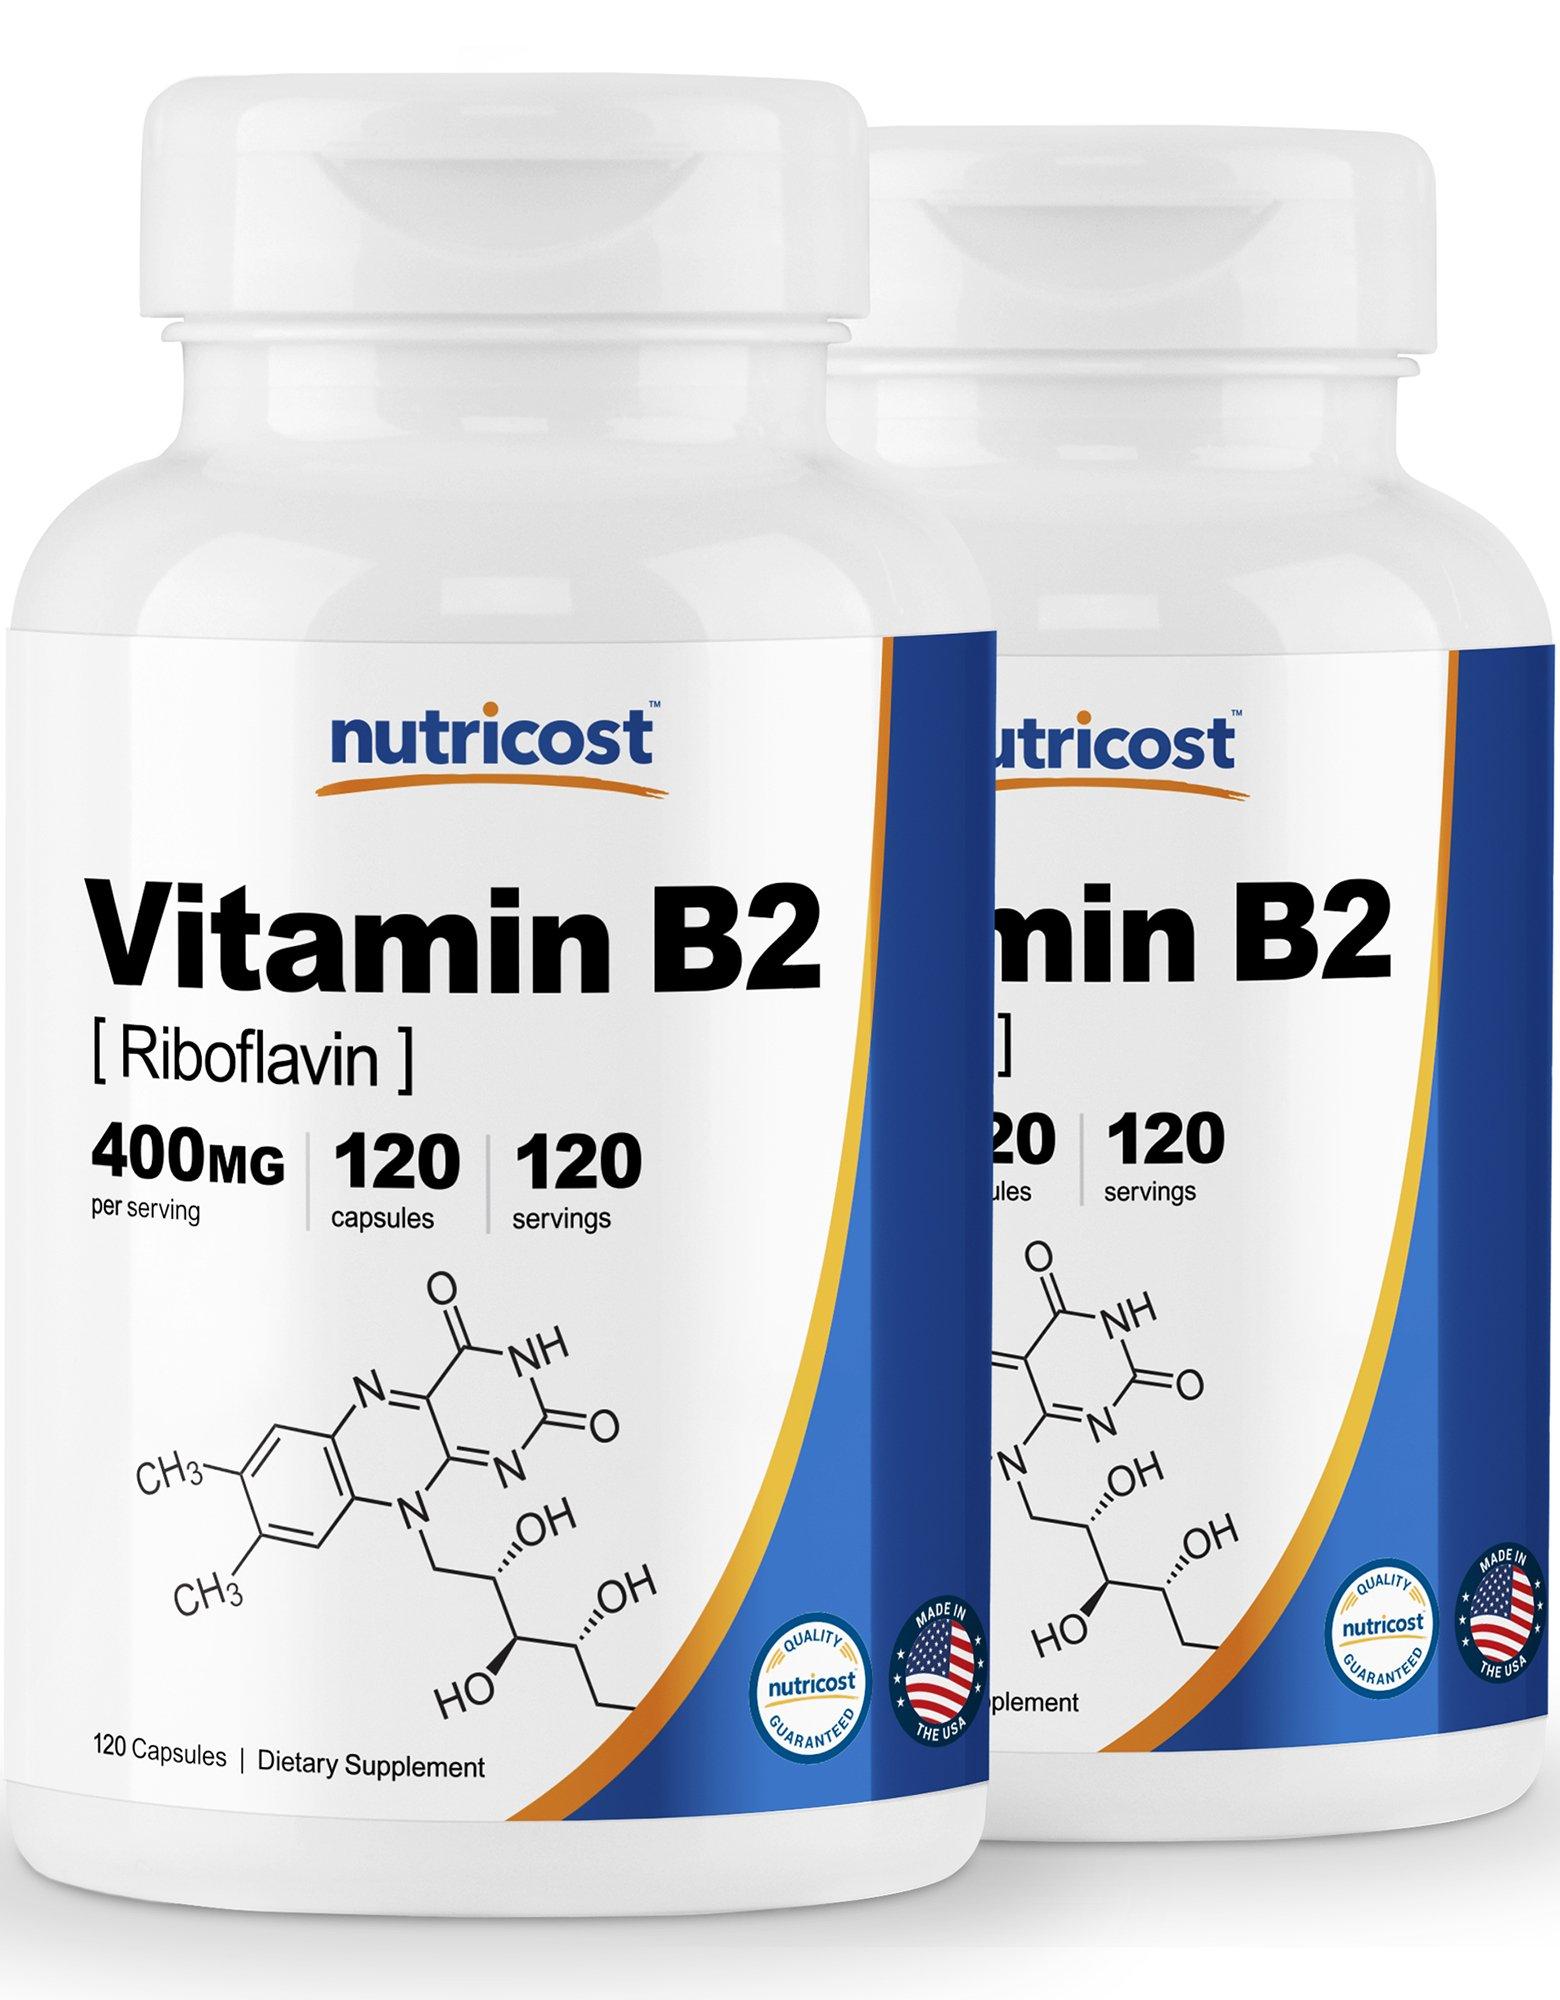 Nutricost Vitamin B2 (Riboflavin) 400mg, 120 Capsules (2 Bottles)